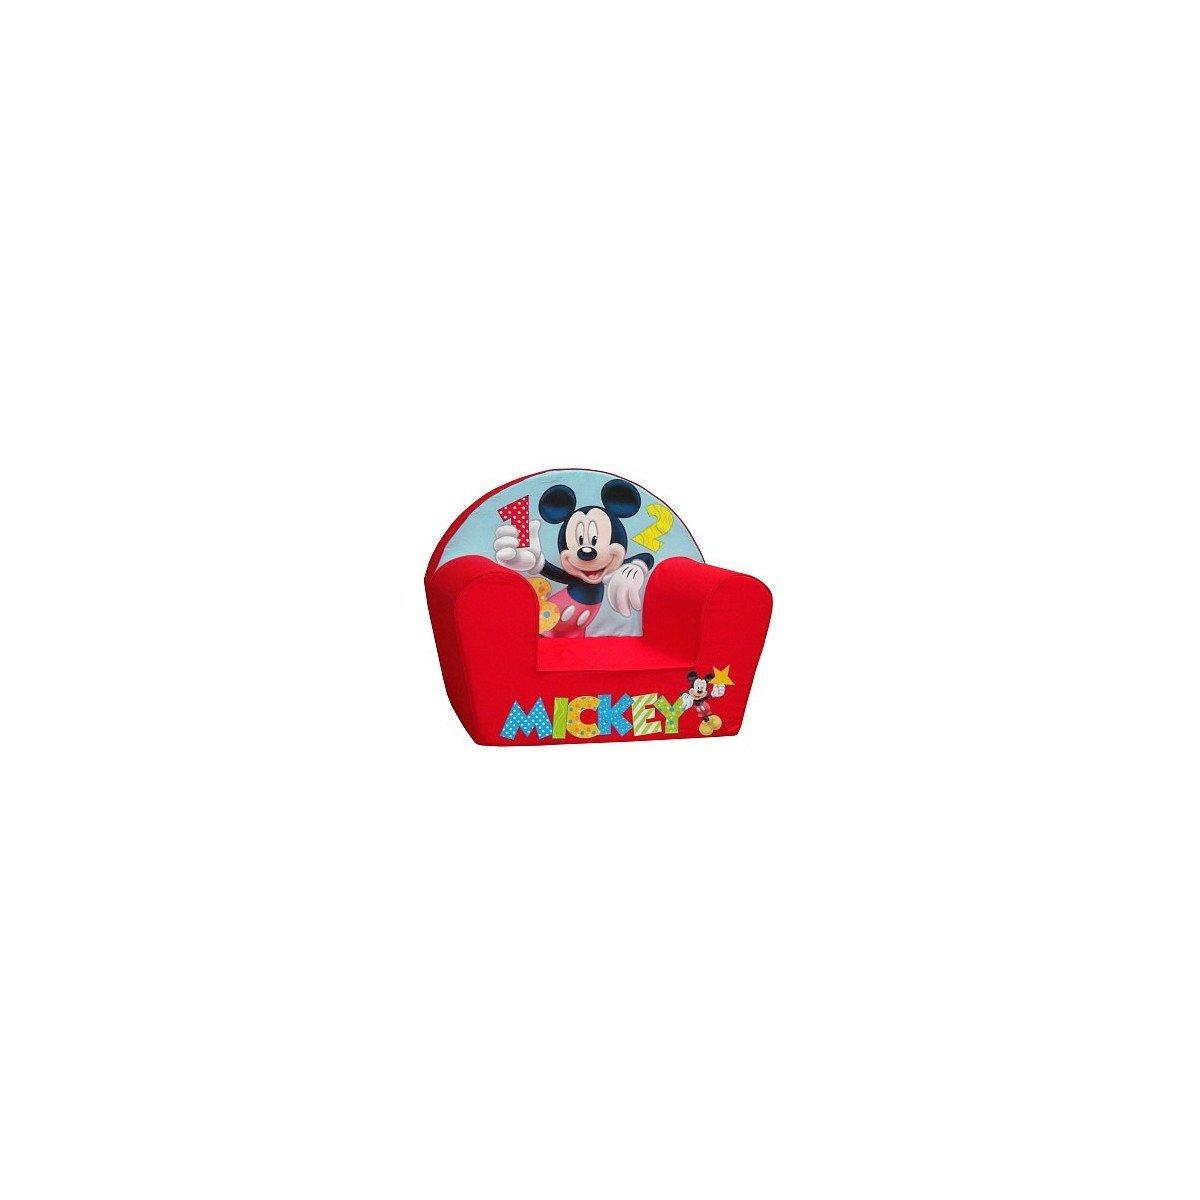 Disney - Poltrona Mickey 1-2-3 - Rosso product image